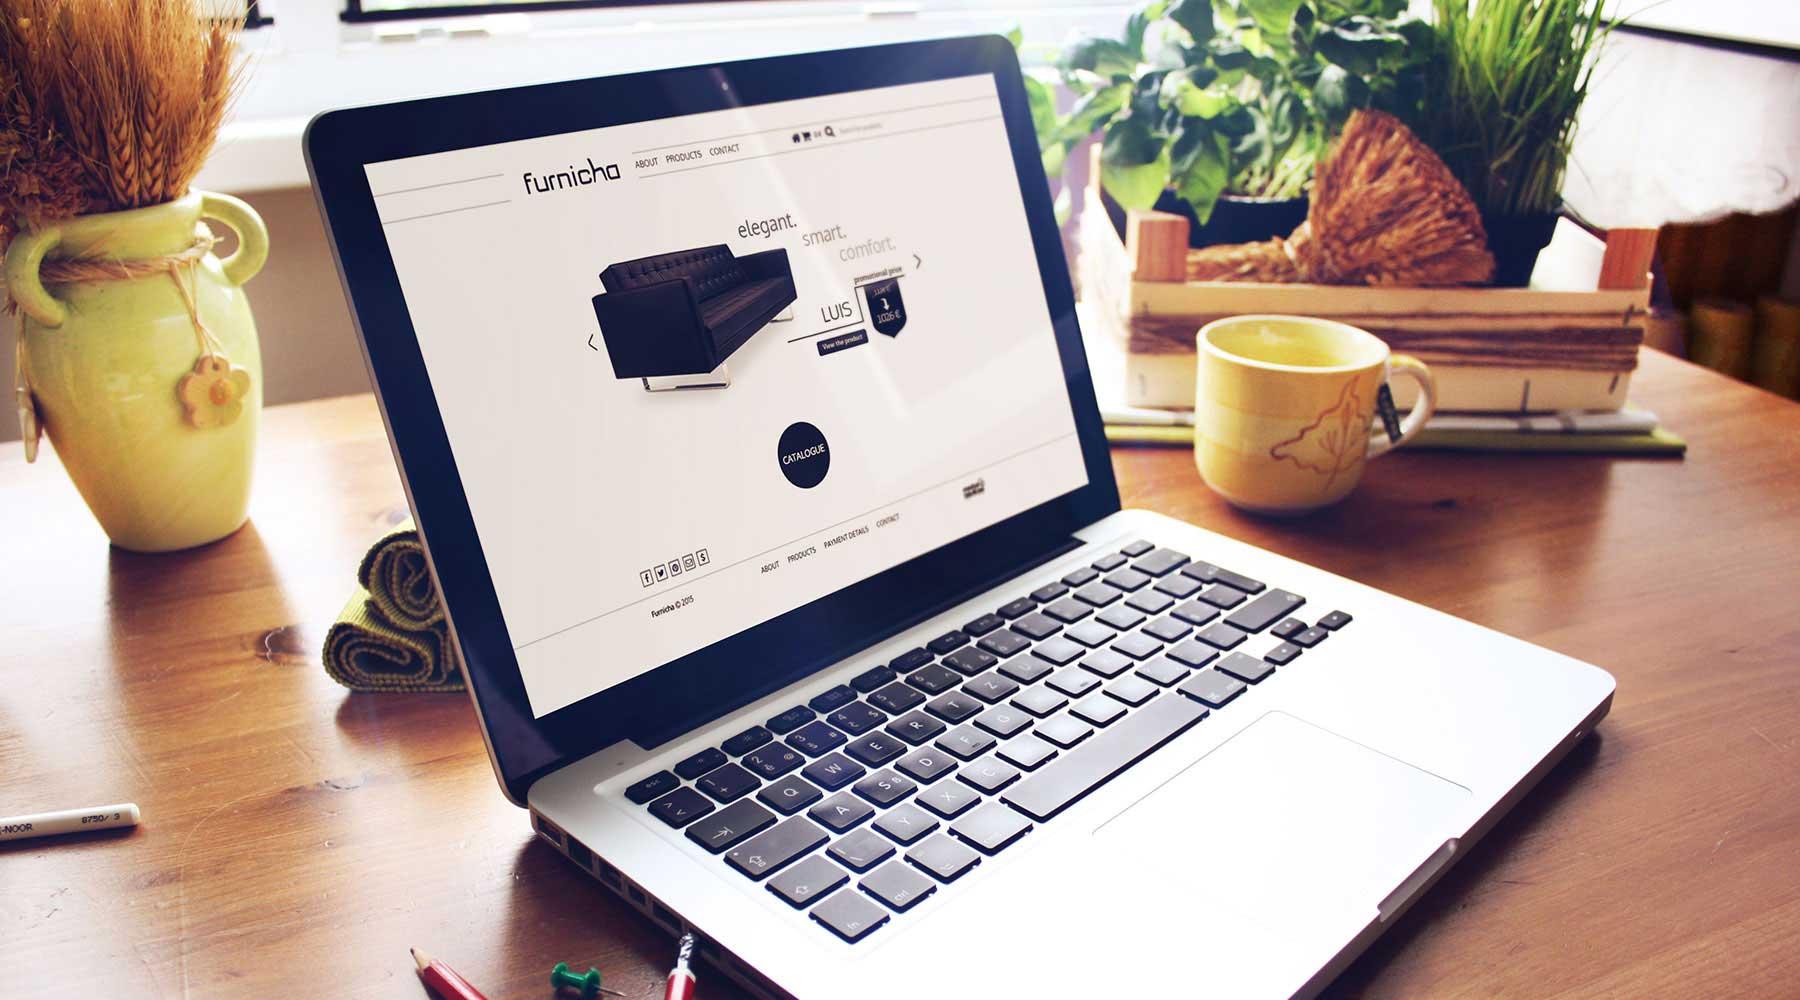 furnicha office furnitures web tasarım